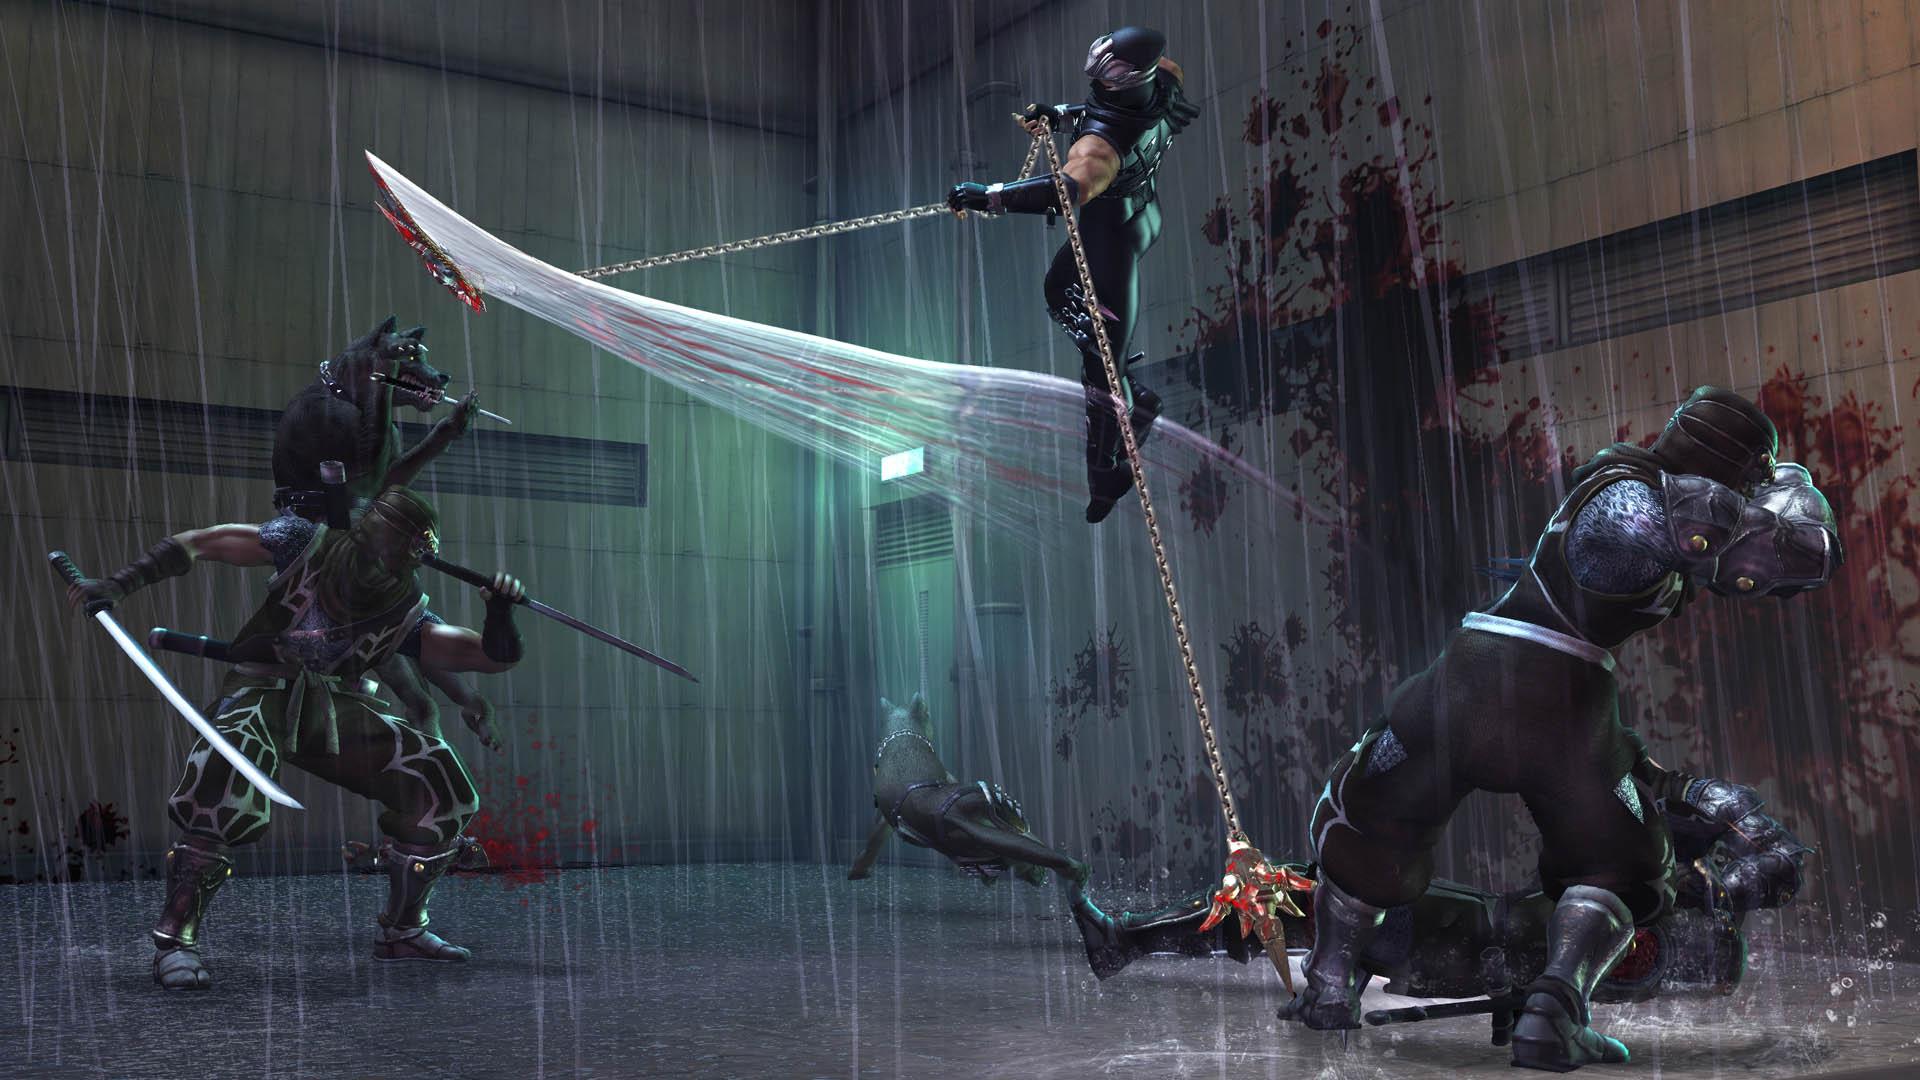 NINJA GAIDEN fantasy anime warrior weapon sword battle chain f    Ninja Weapons Wallpaper